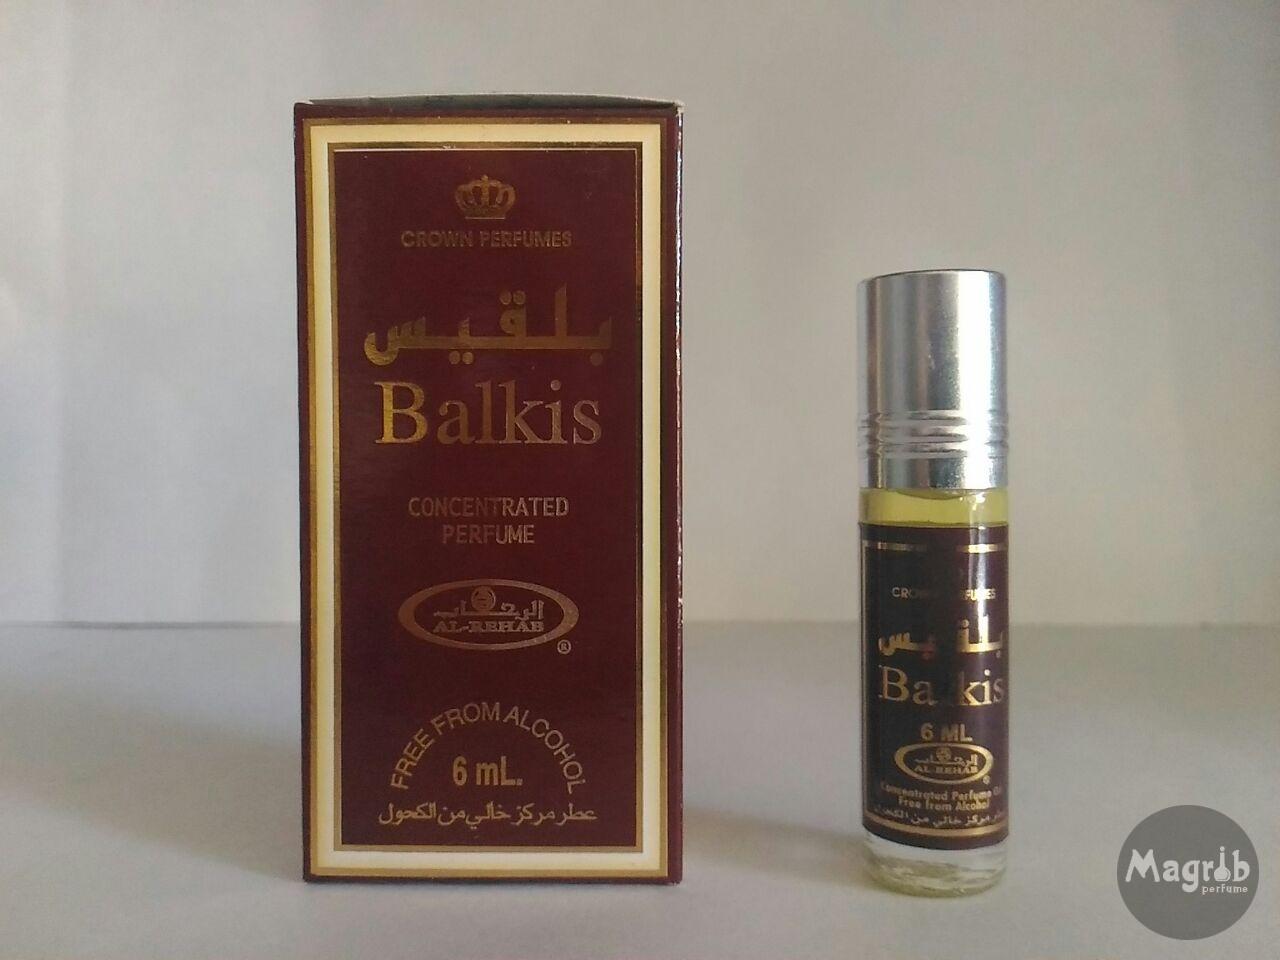 Al-Rehab-Balkis 6ml- масляные духи, роллер.